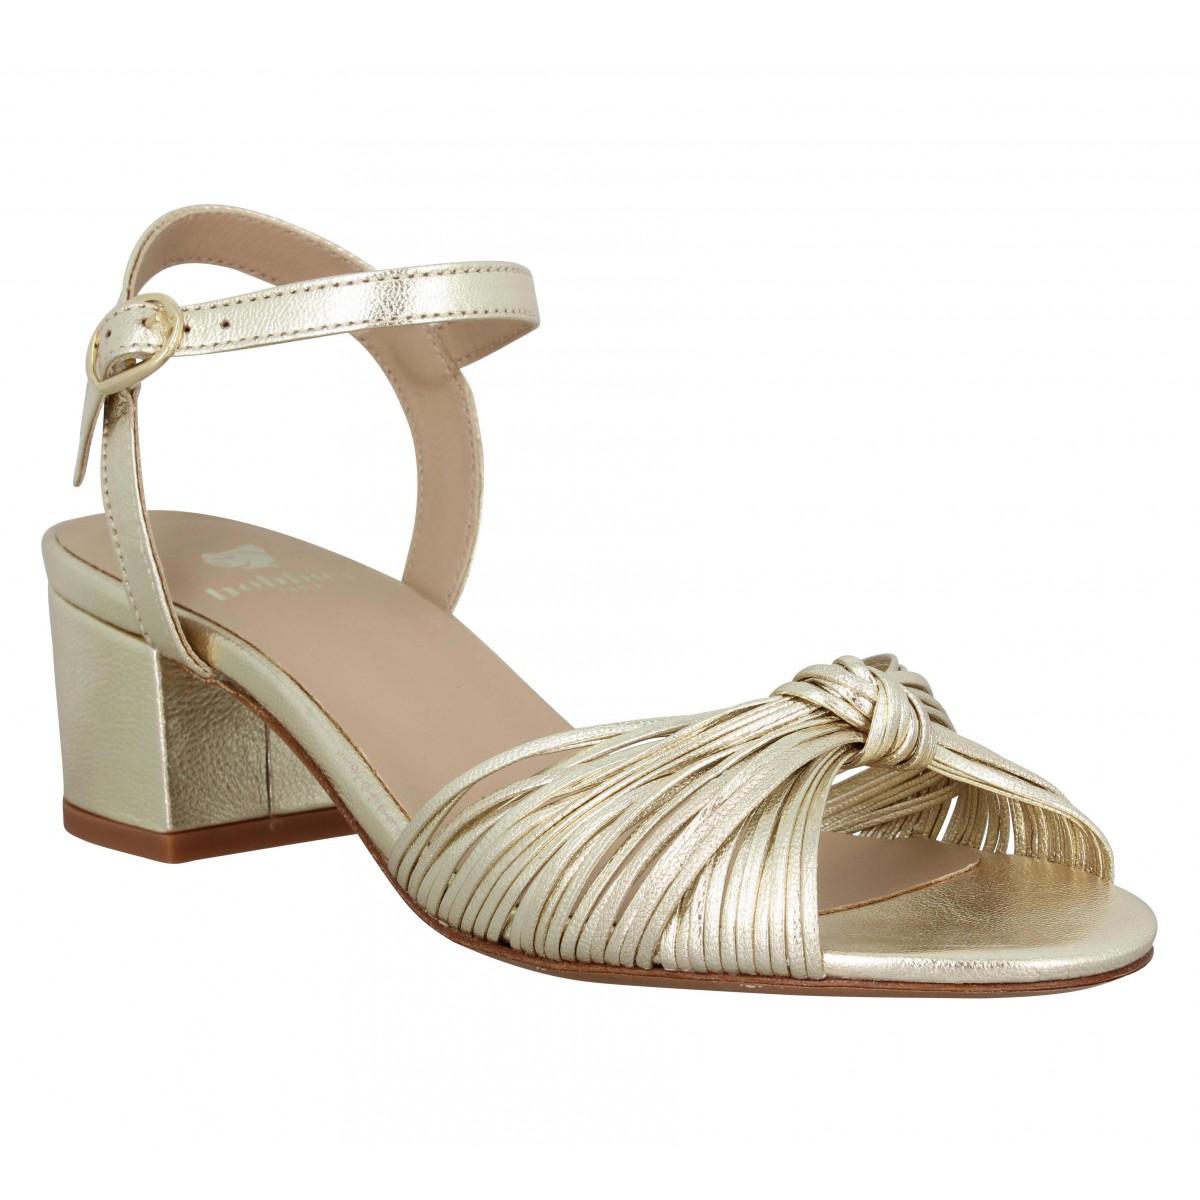 Sandales talons BOBBIES L'Astrale cuir lamine Femme Or Champagne